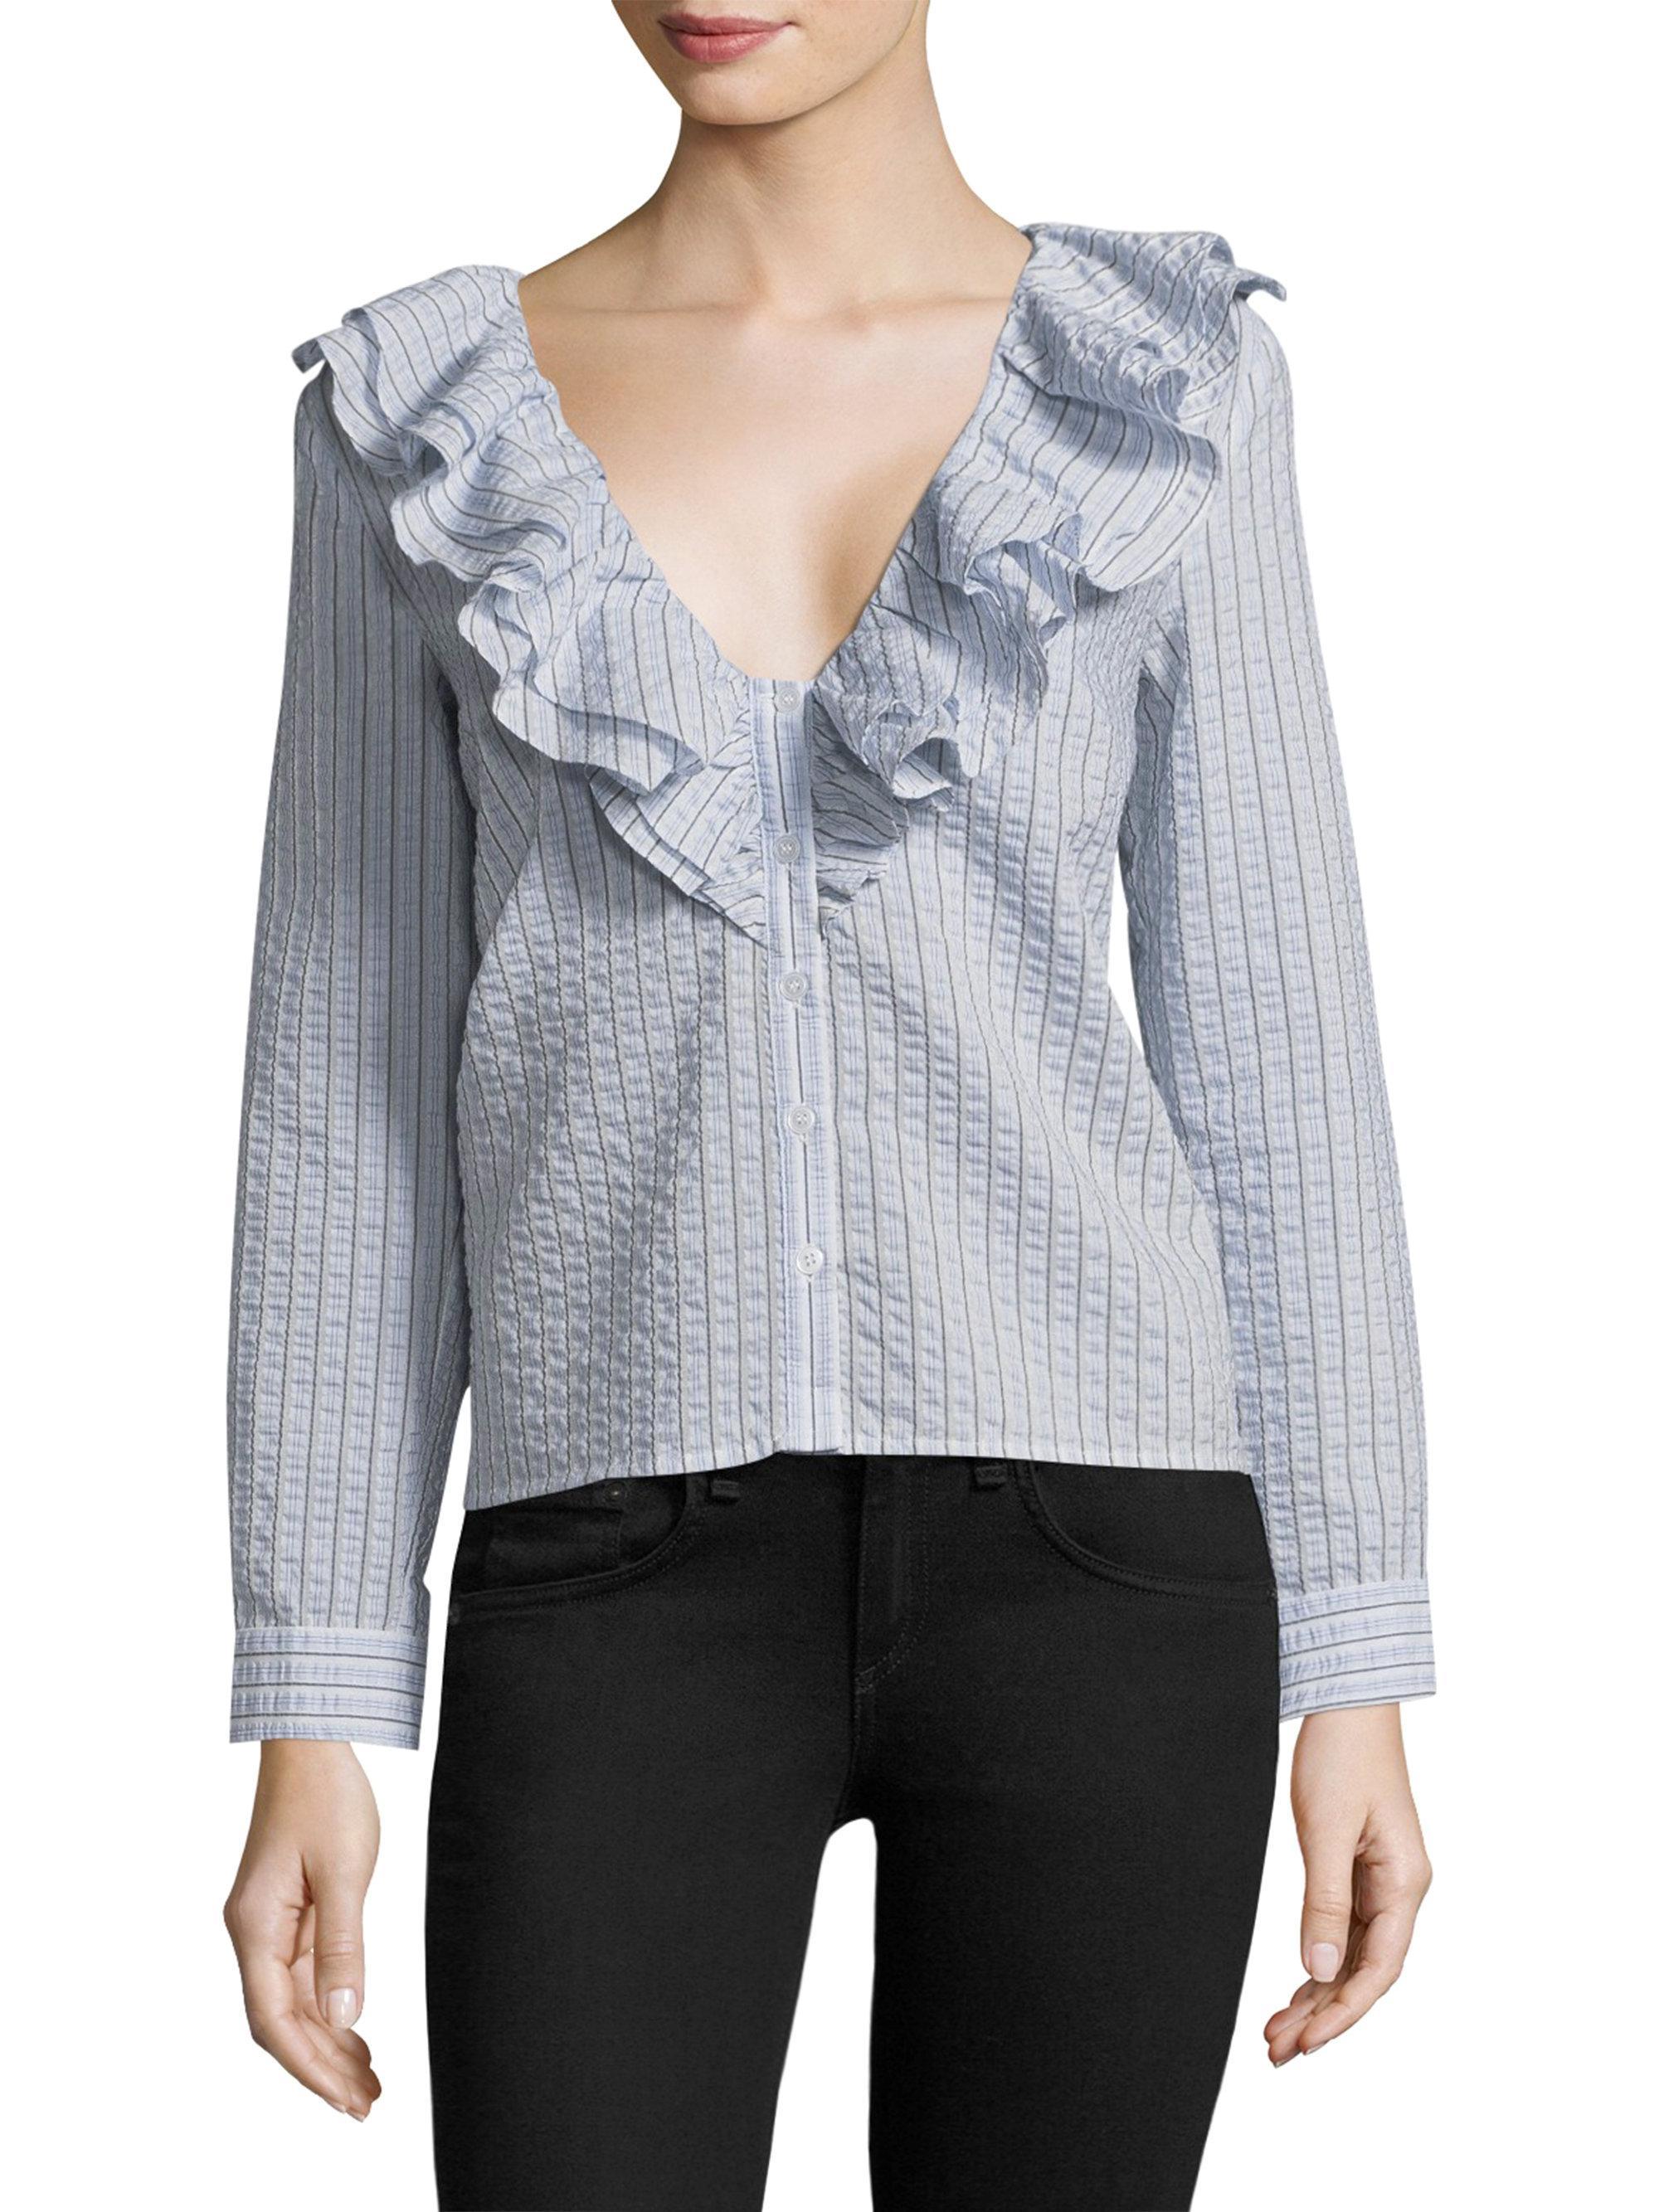 Sale Nicekicks Ganni Charron ruffle stripe shirt Find Great Cheap Online Free Shipping With Credit Card Great Deals Sale Online Wu5qon